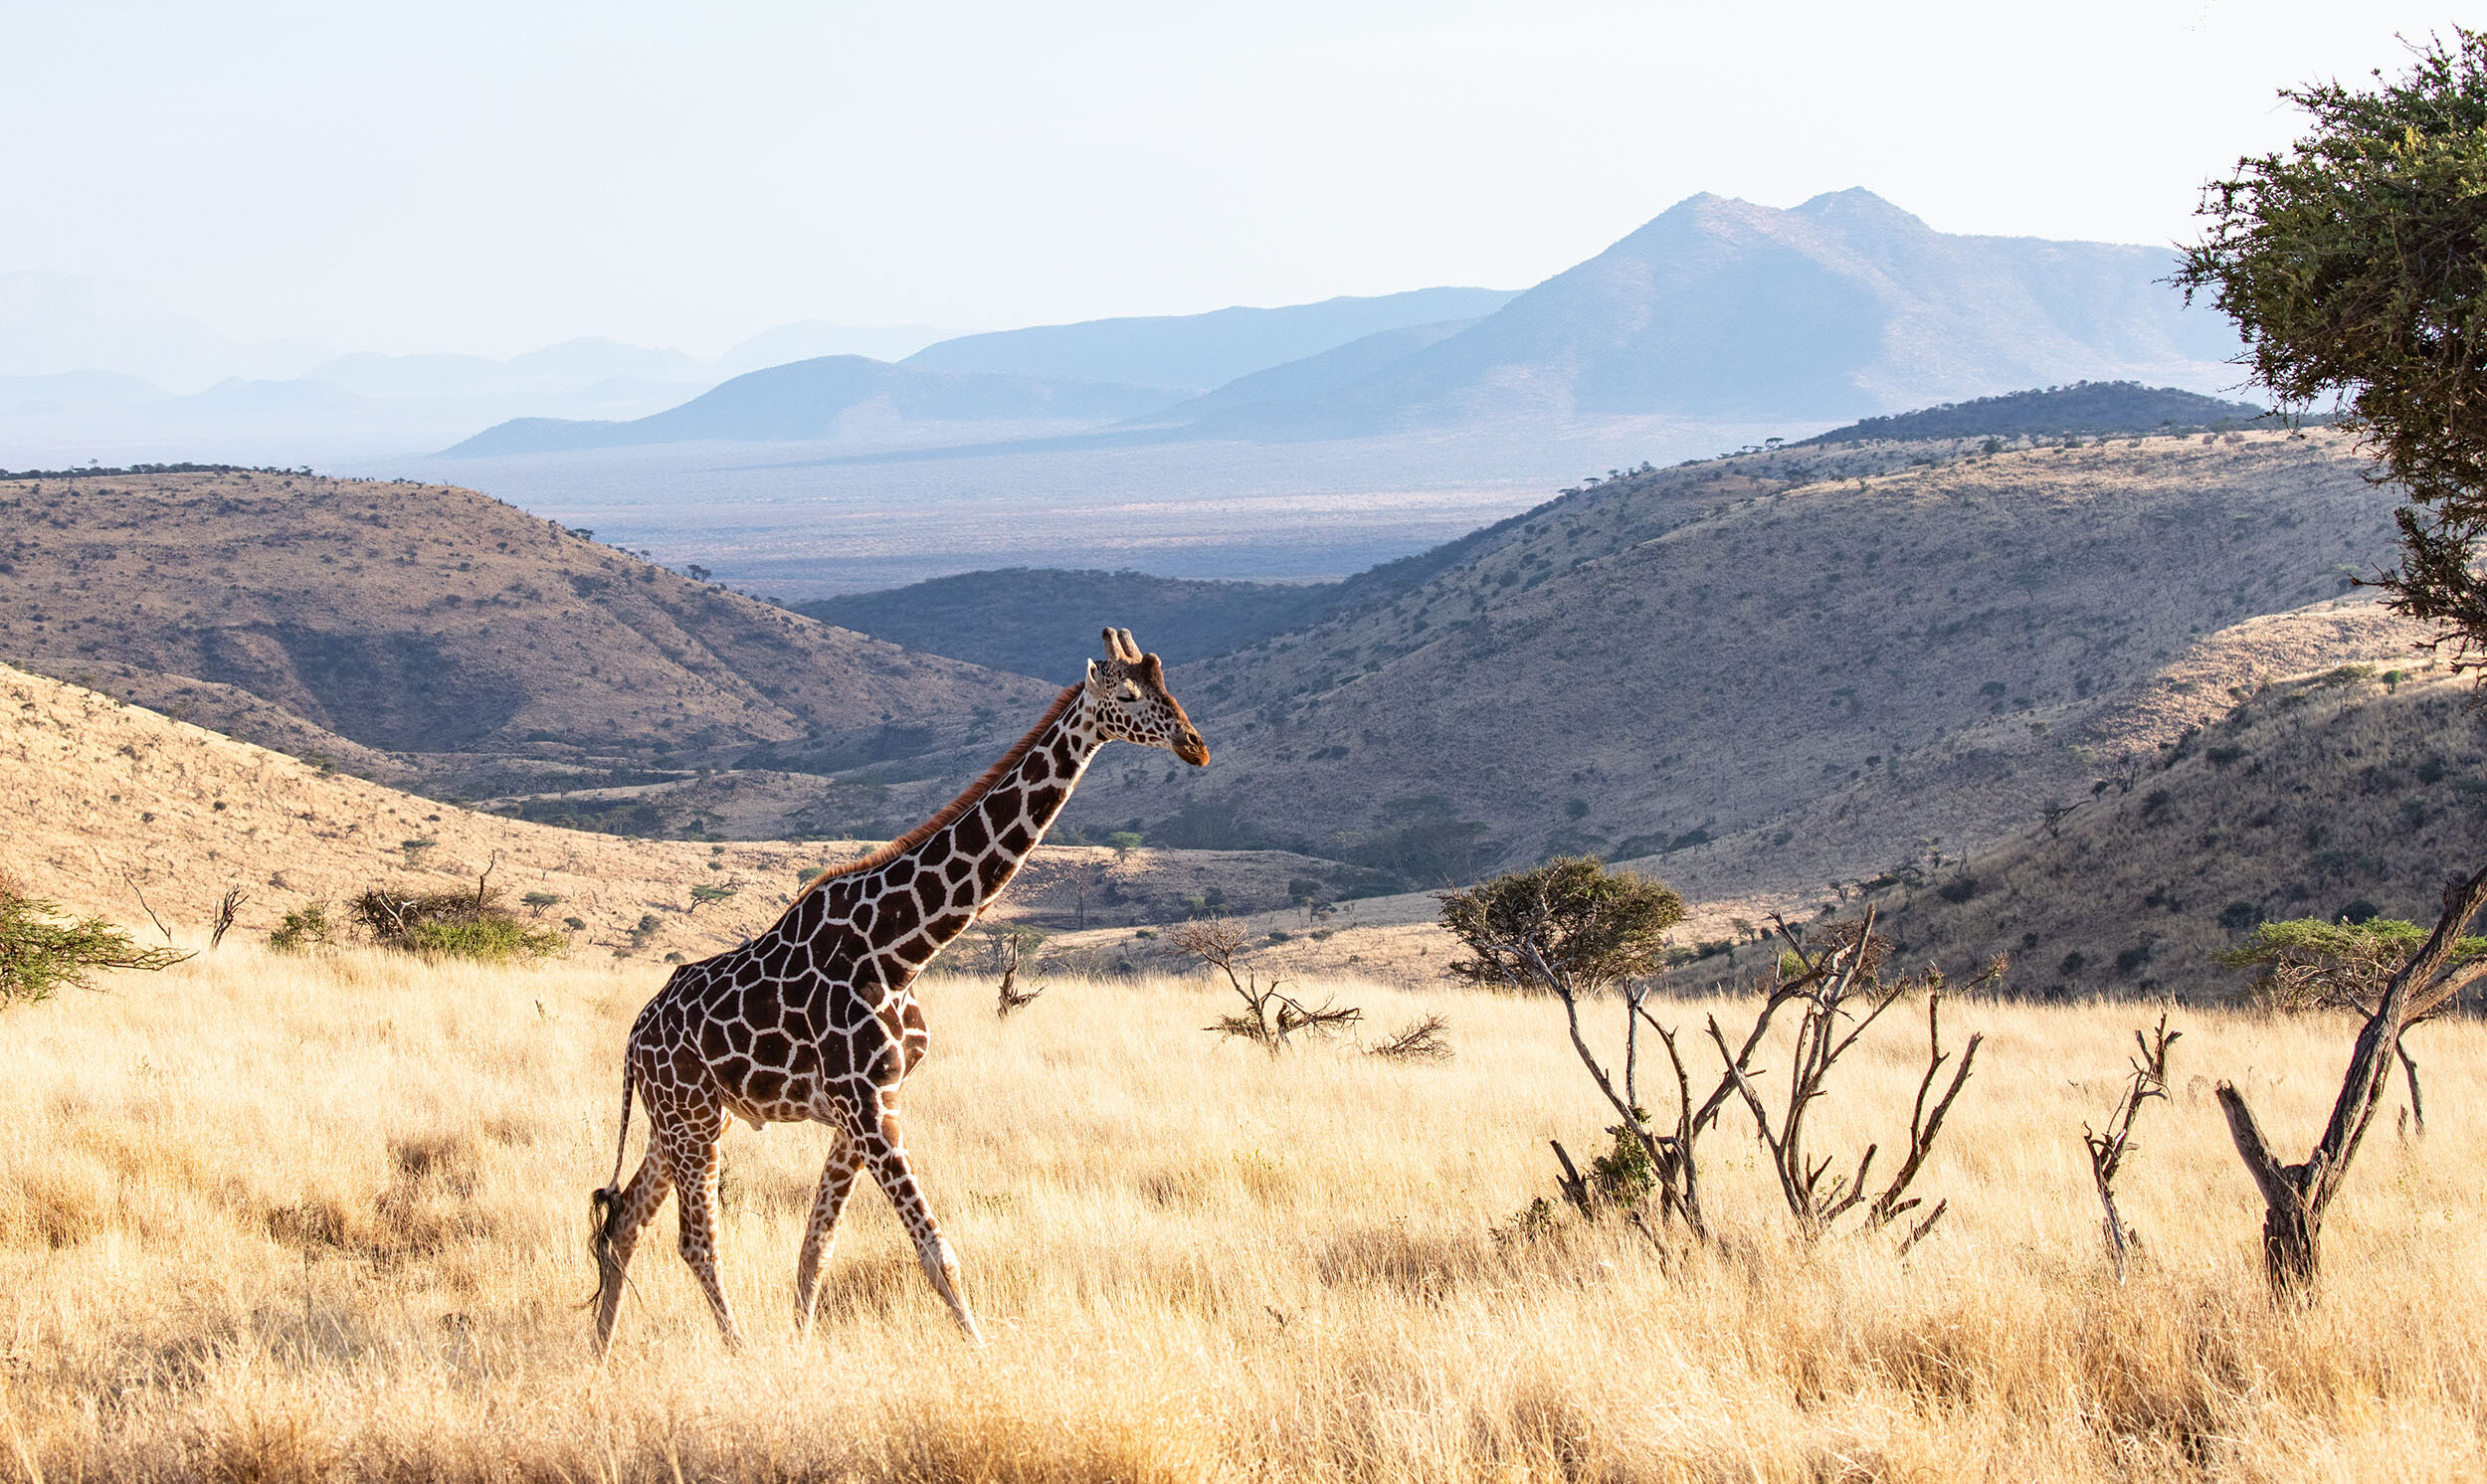 Kenya Lewa downs giraffe safari